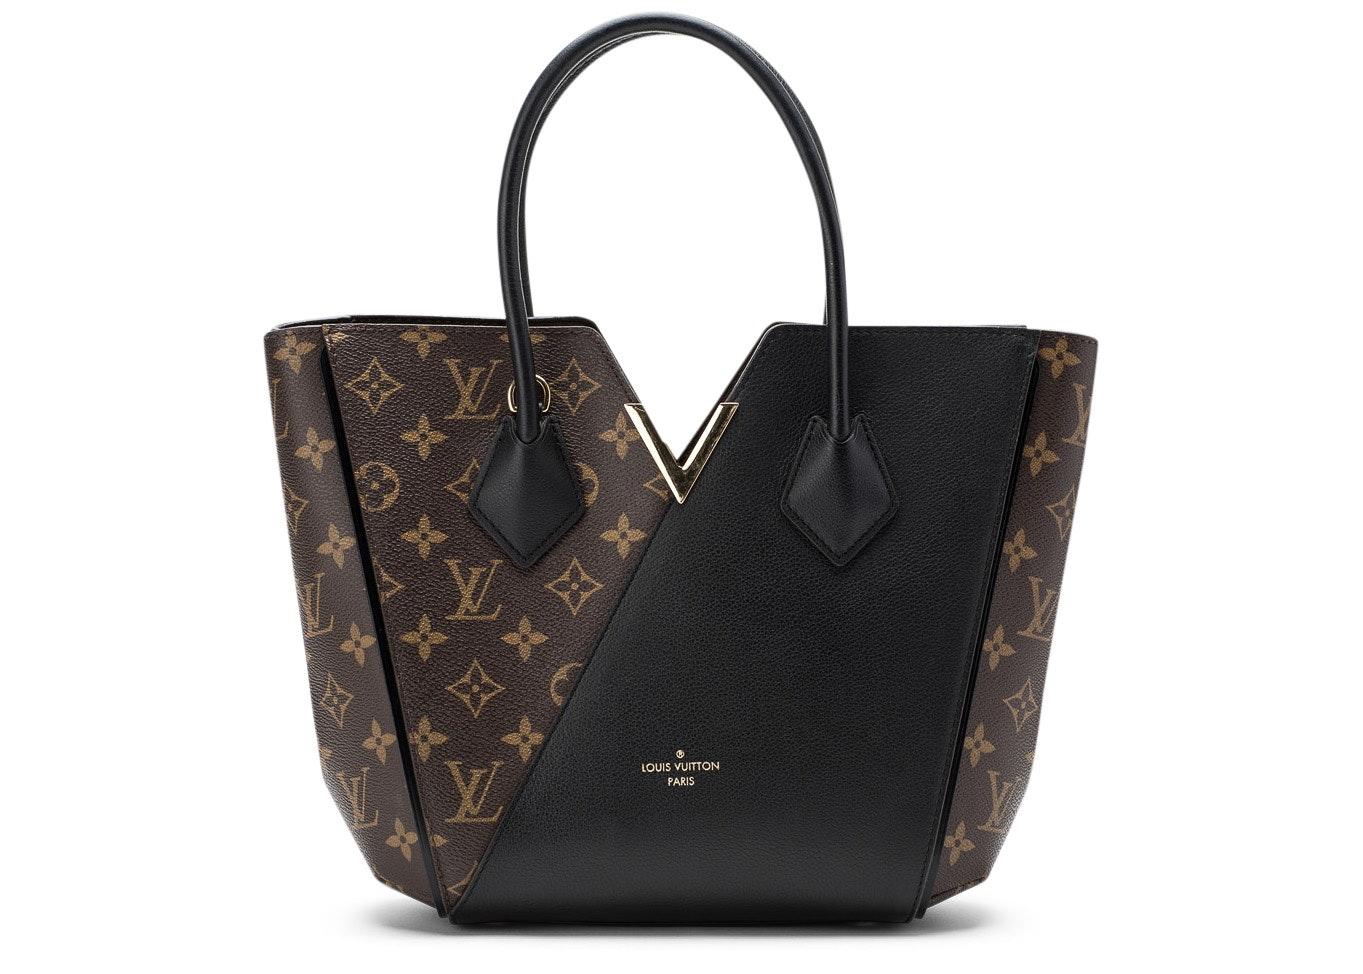 Louis Vuitton Kimono Monogram PM Noir Black